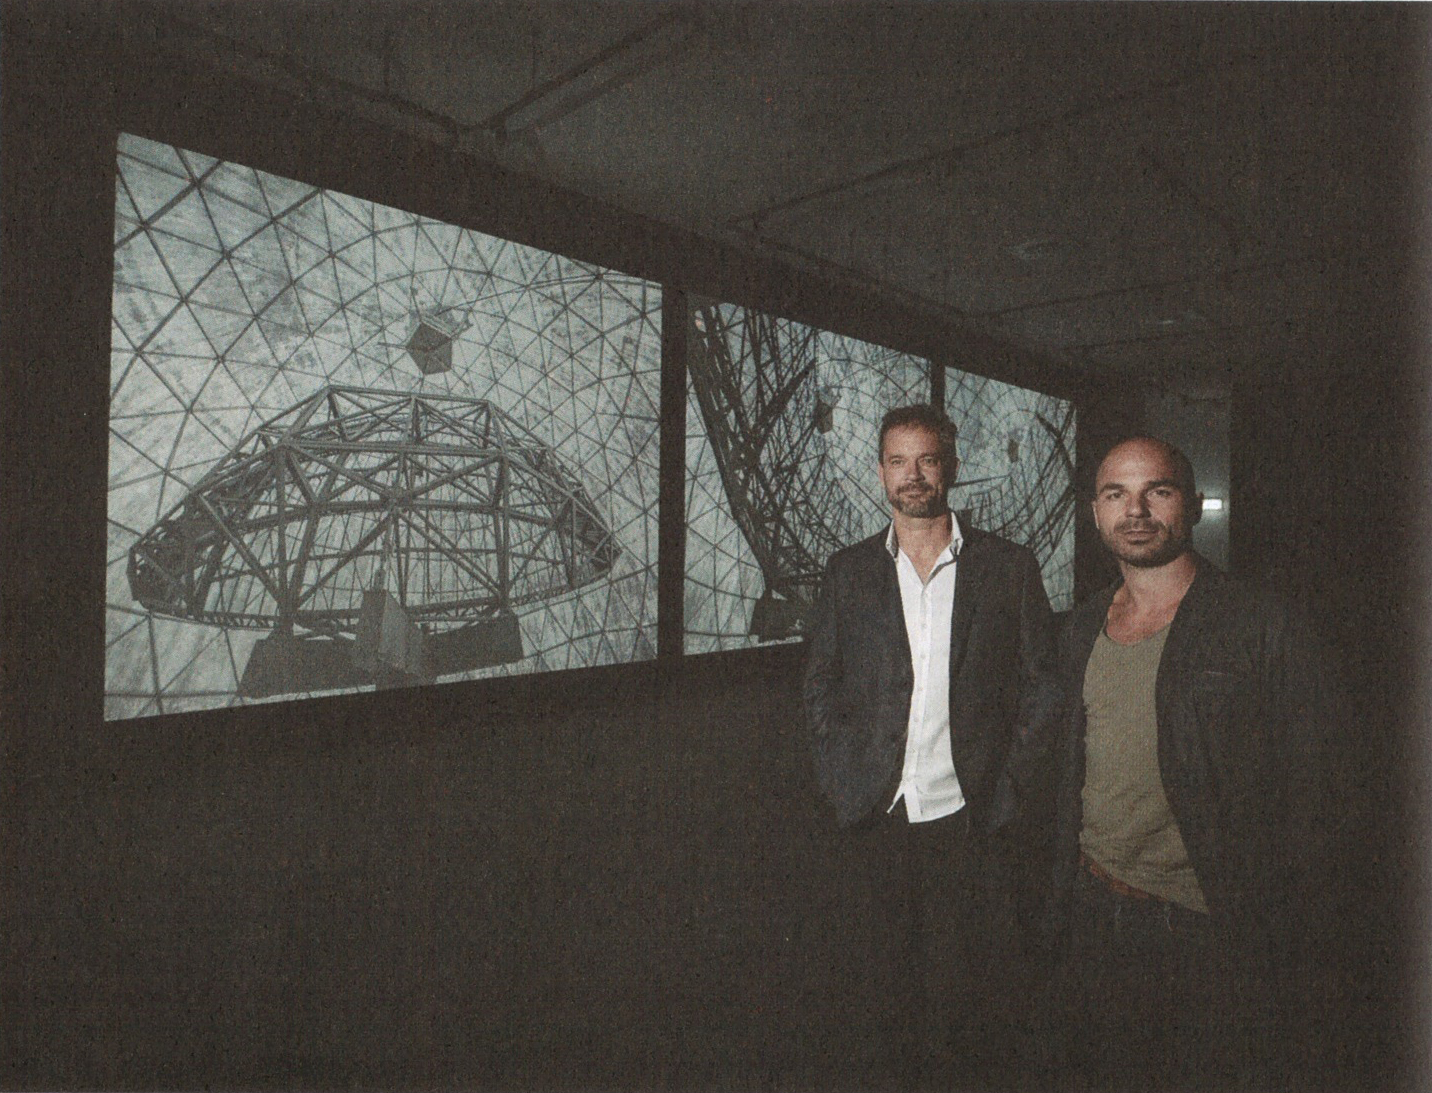 Murray Fredericks and Tom Schutzinger,  installation view.  Photograph by Reg Ryan.